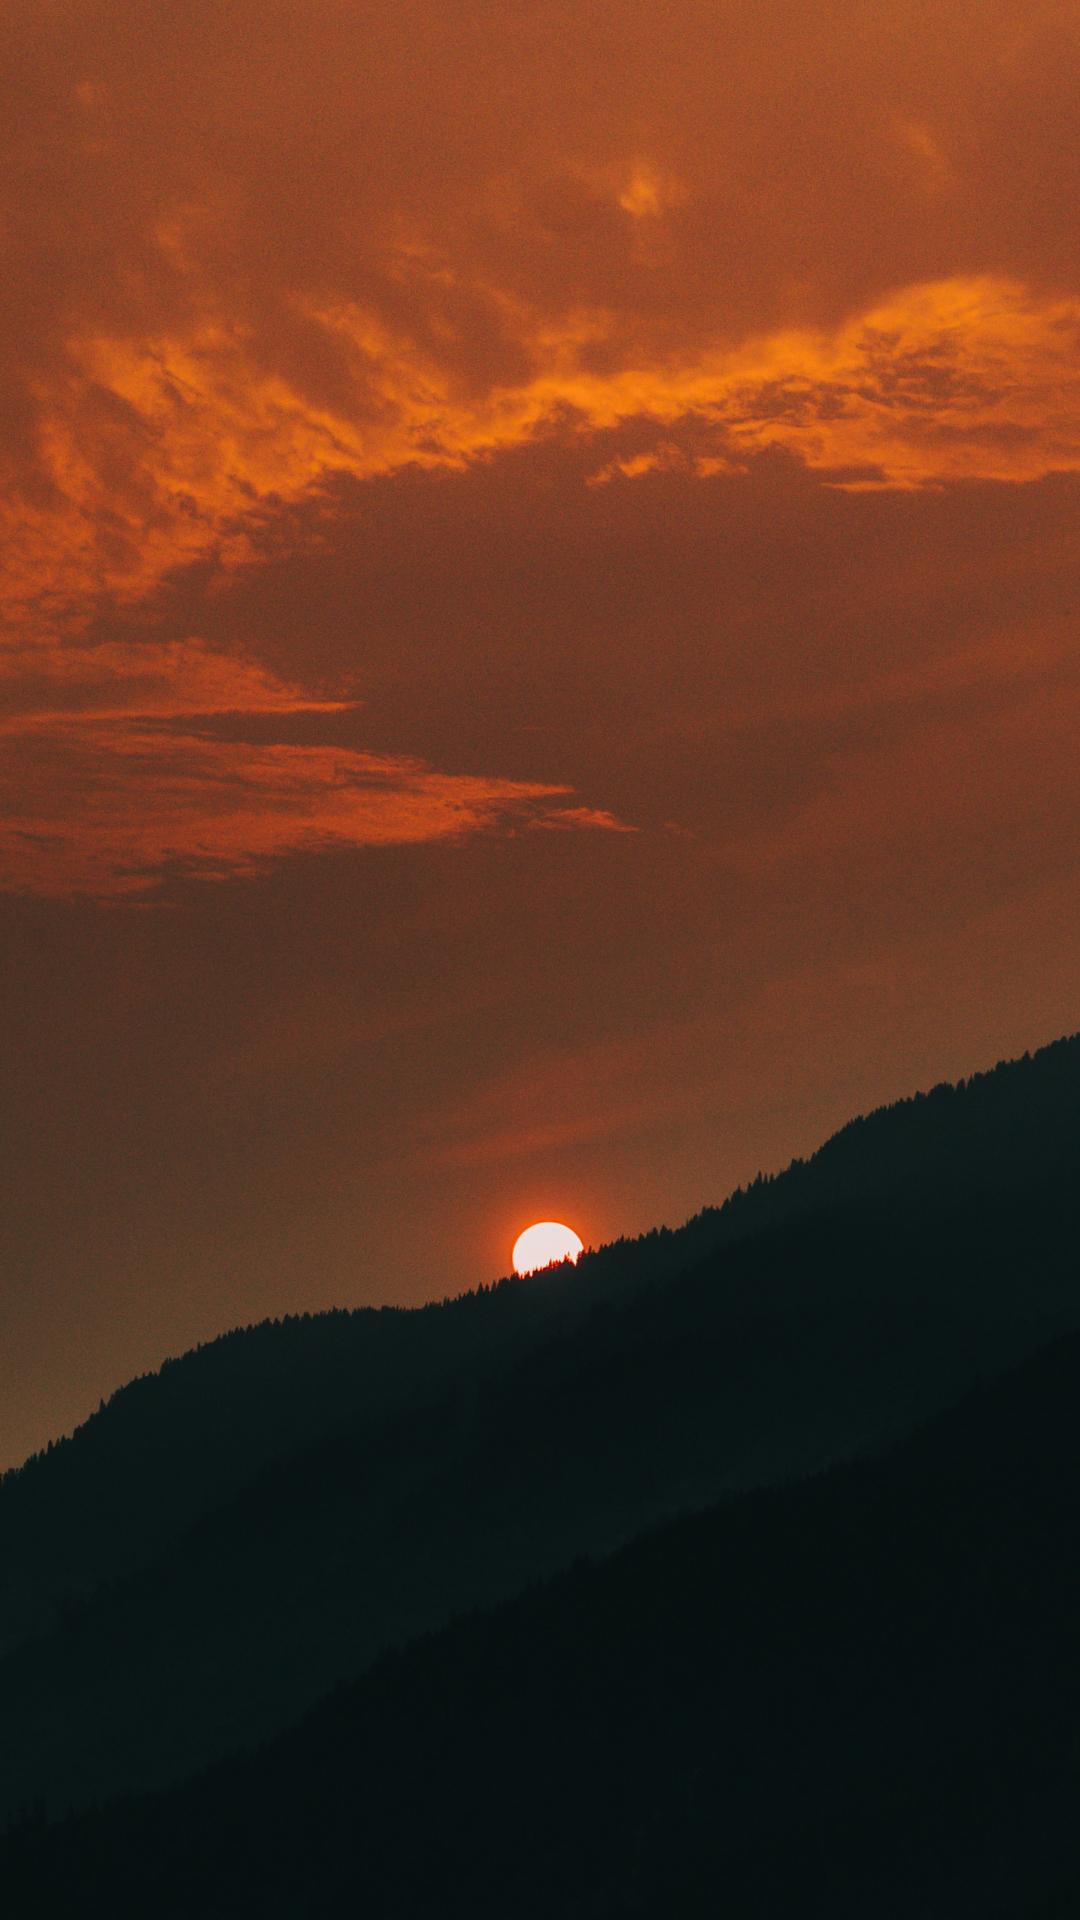 Sunset, Sun, Orange iPhone Wallpaper